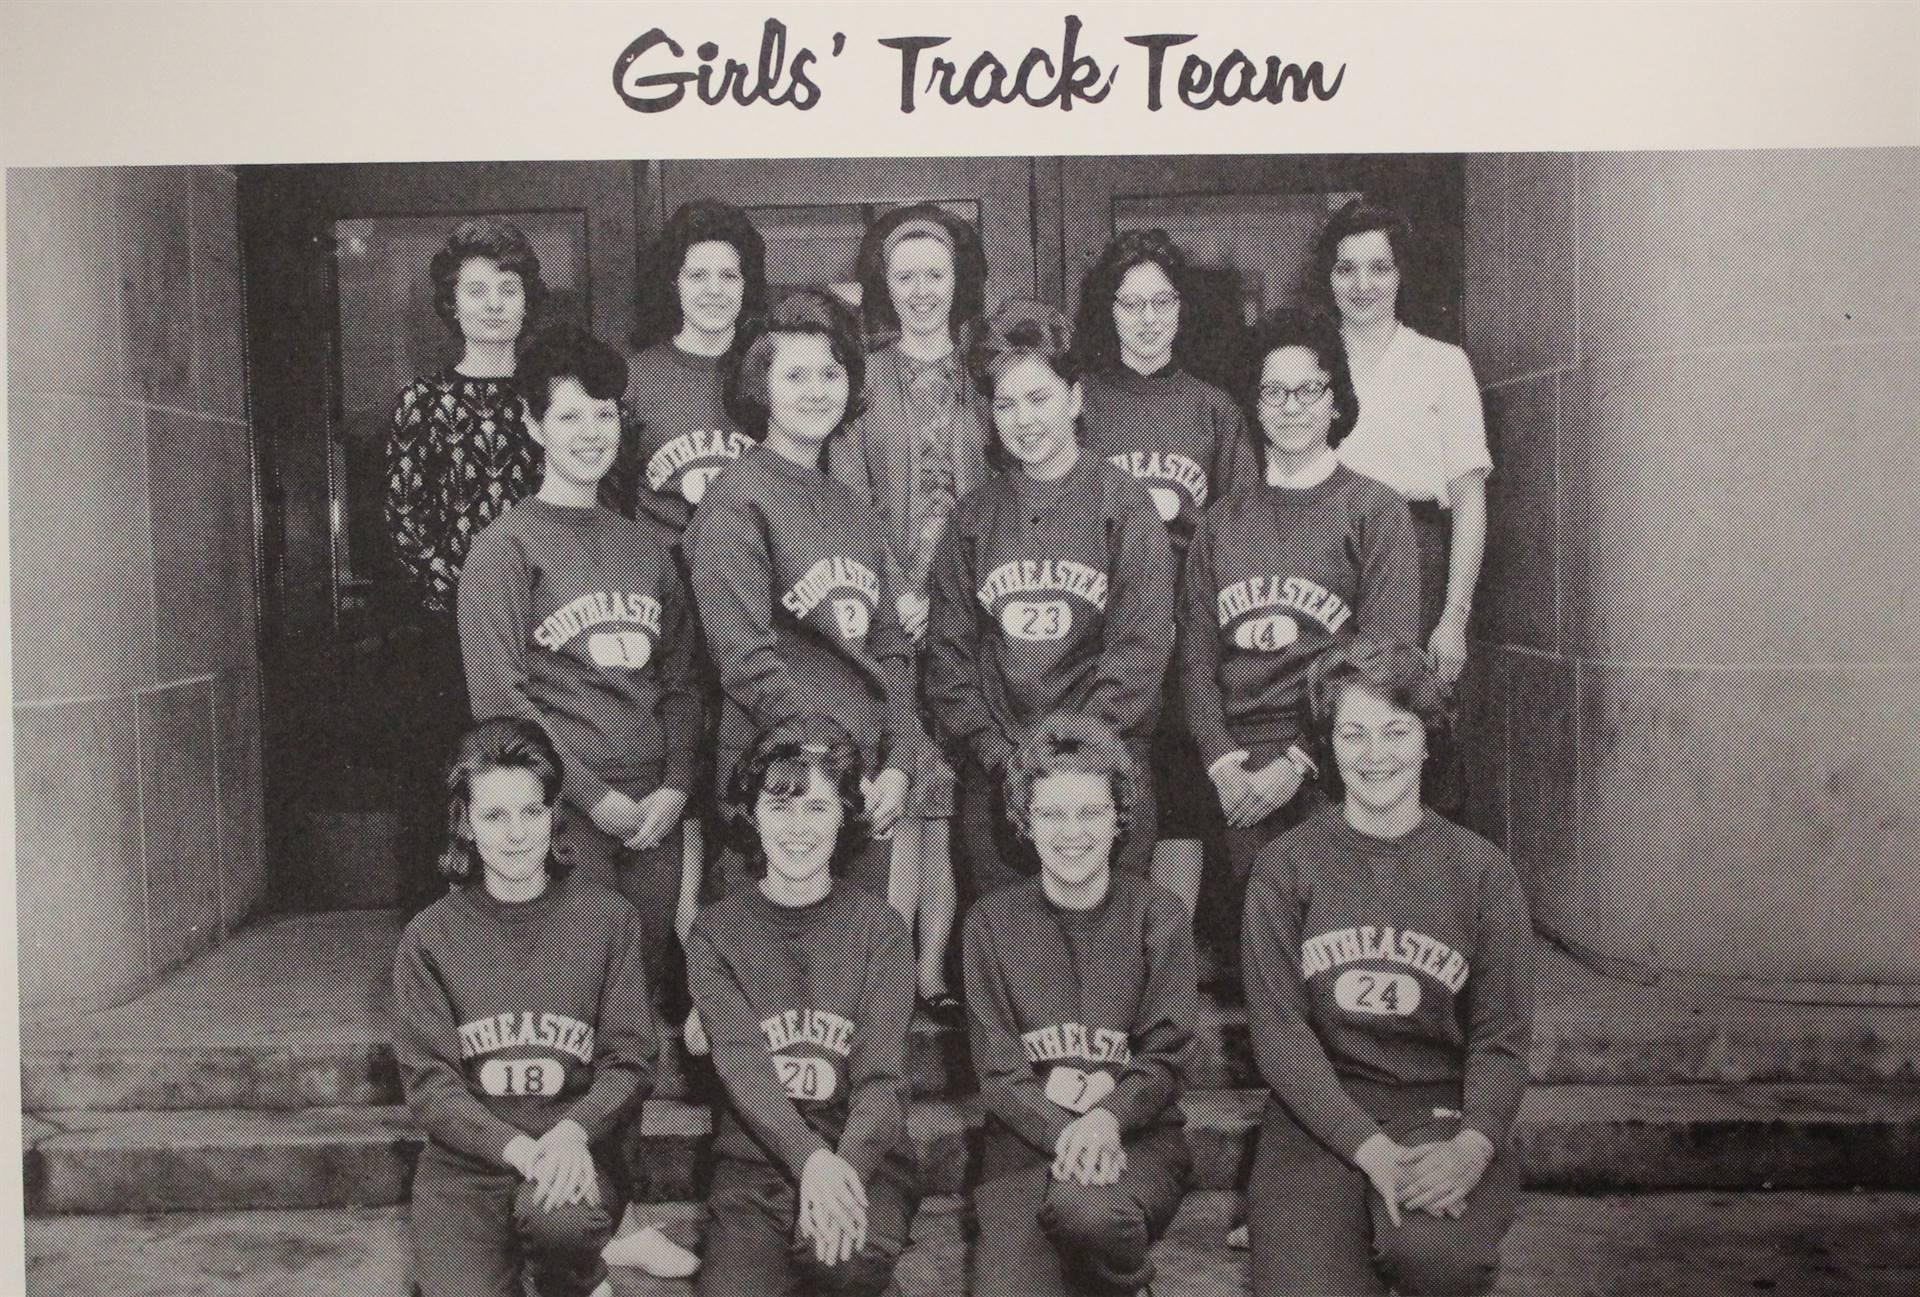 1964 Gir'ls Track Team